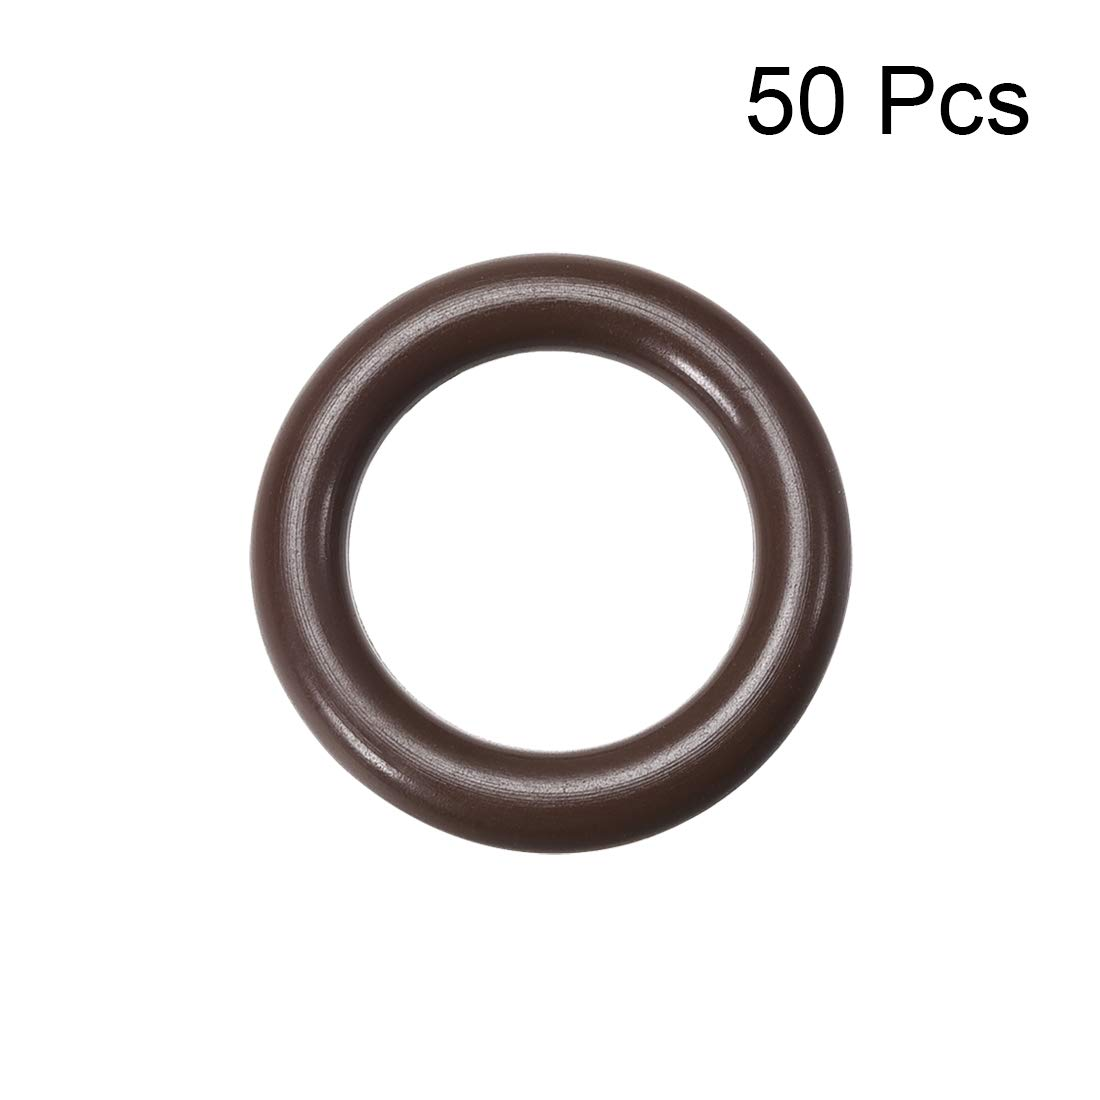 Seal Gasket Brown 50Pcs uxcell Fluorine Rubber O Rings 4mm Inner Diameter 3.5mm Width 11mm OD